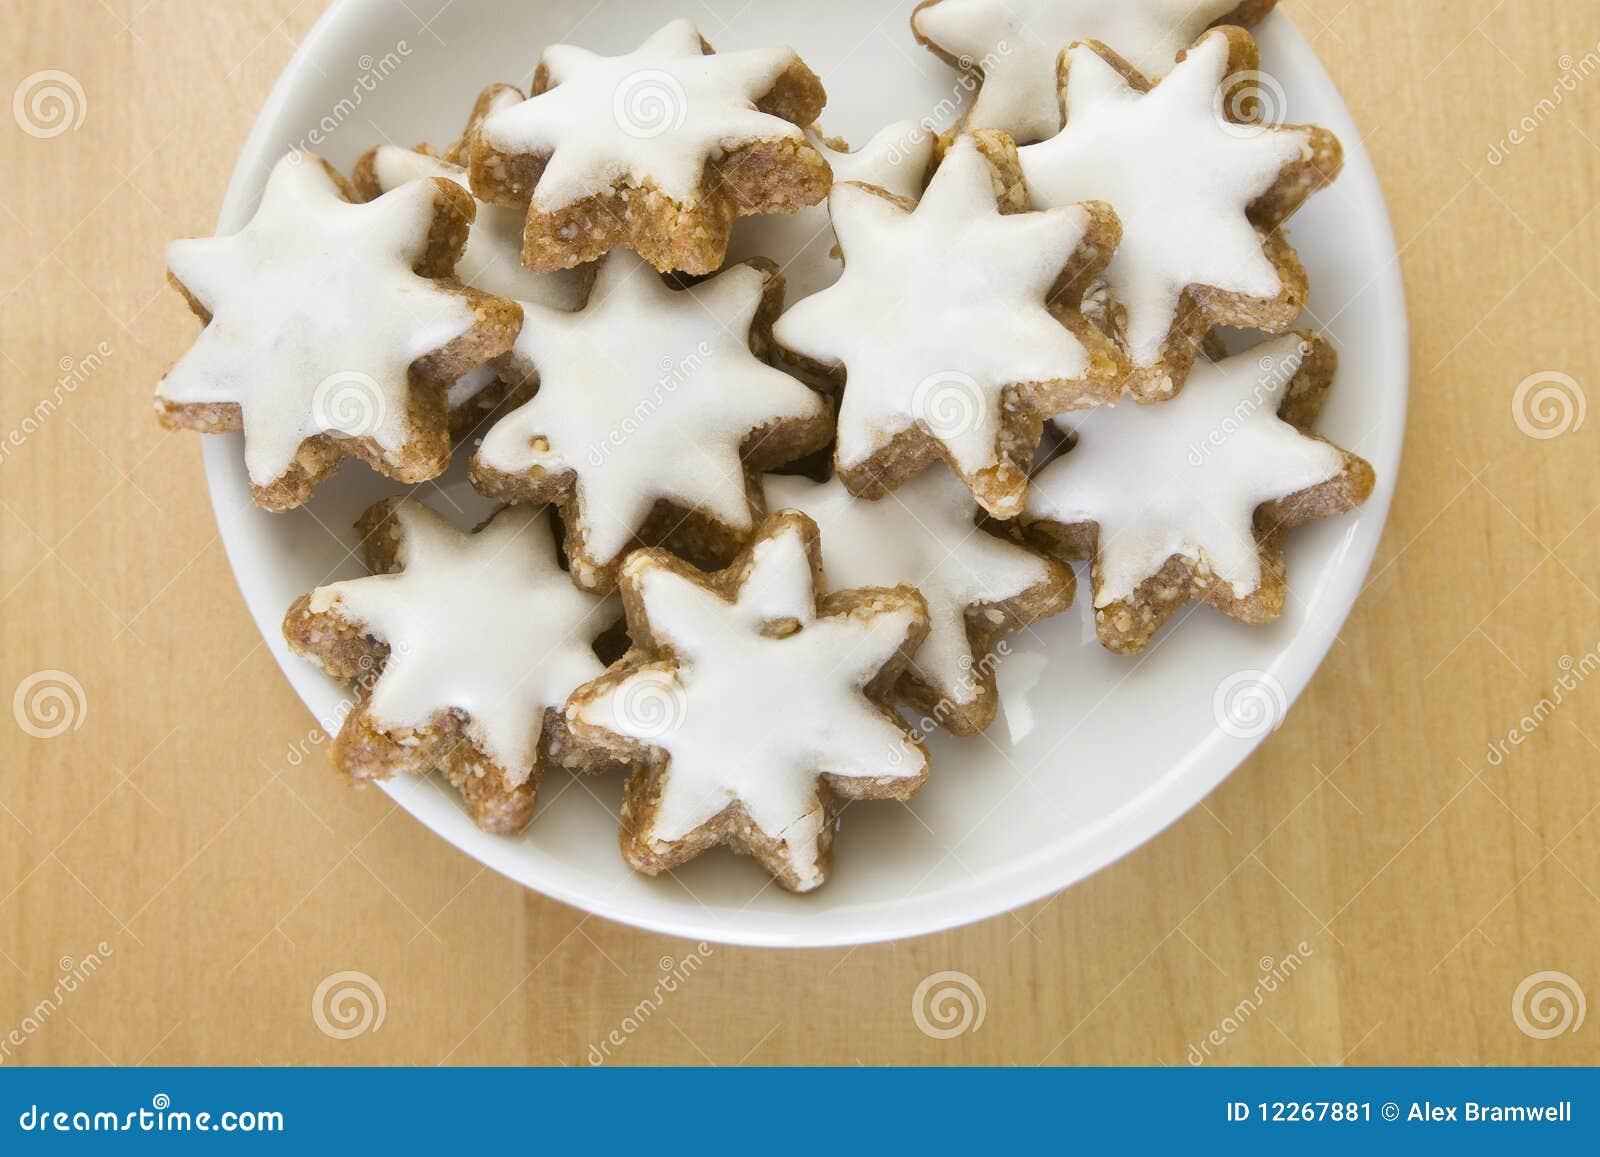 Zimtsterne Cookies Stock Image Image Of Star Food Christmas